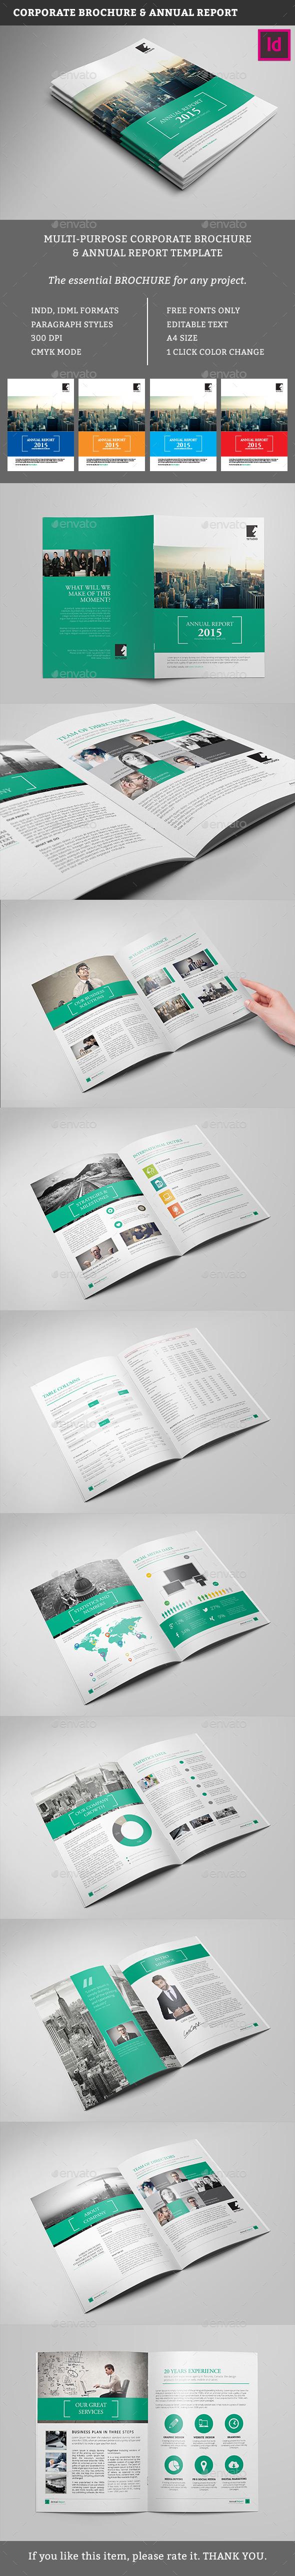 Multipurpose Business Brochure Template - Corporate Brochures